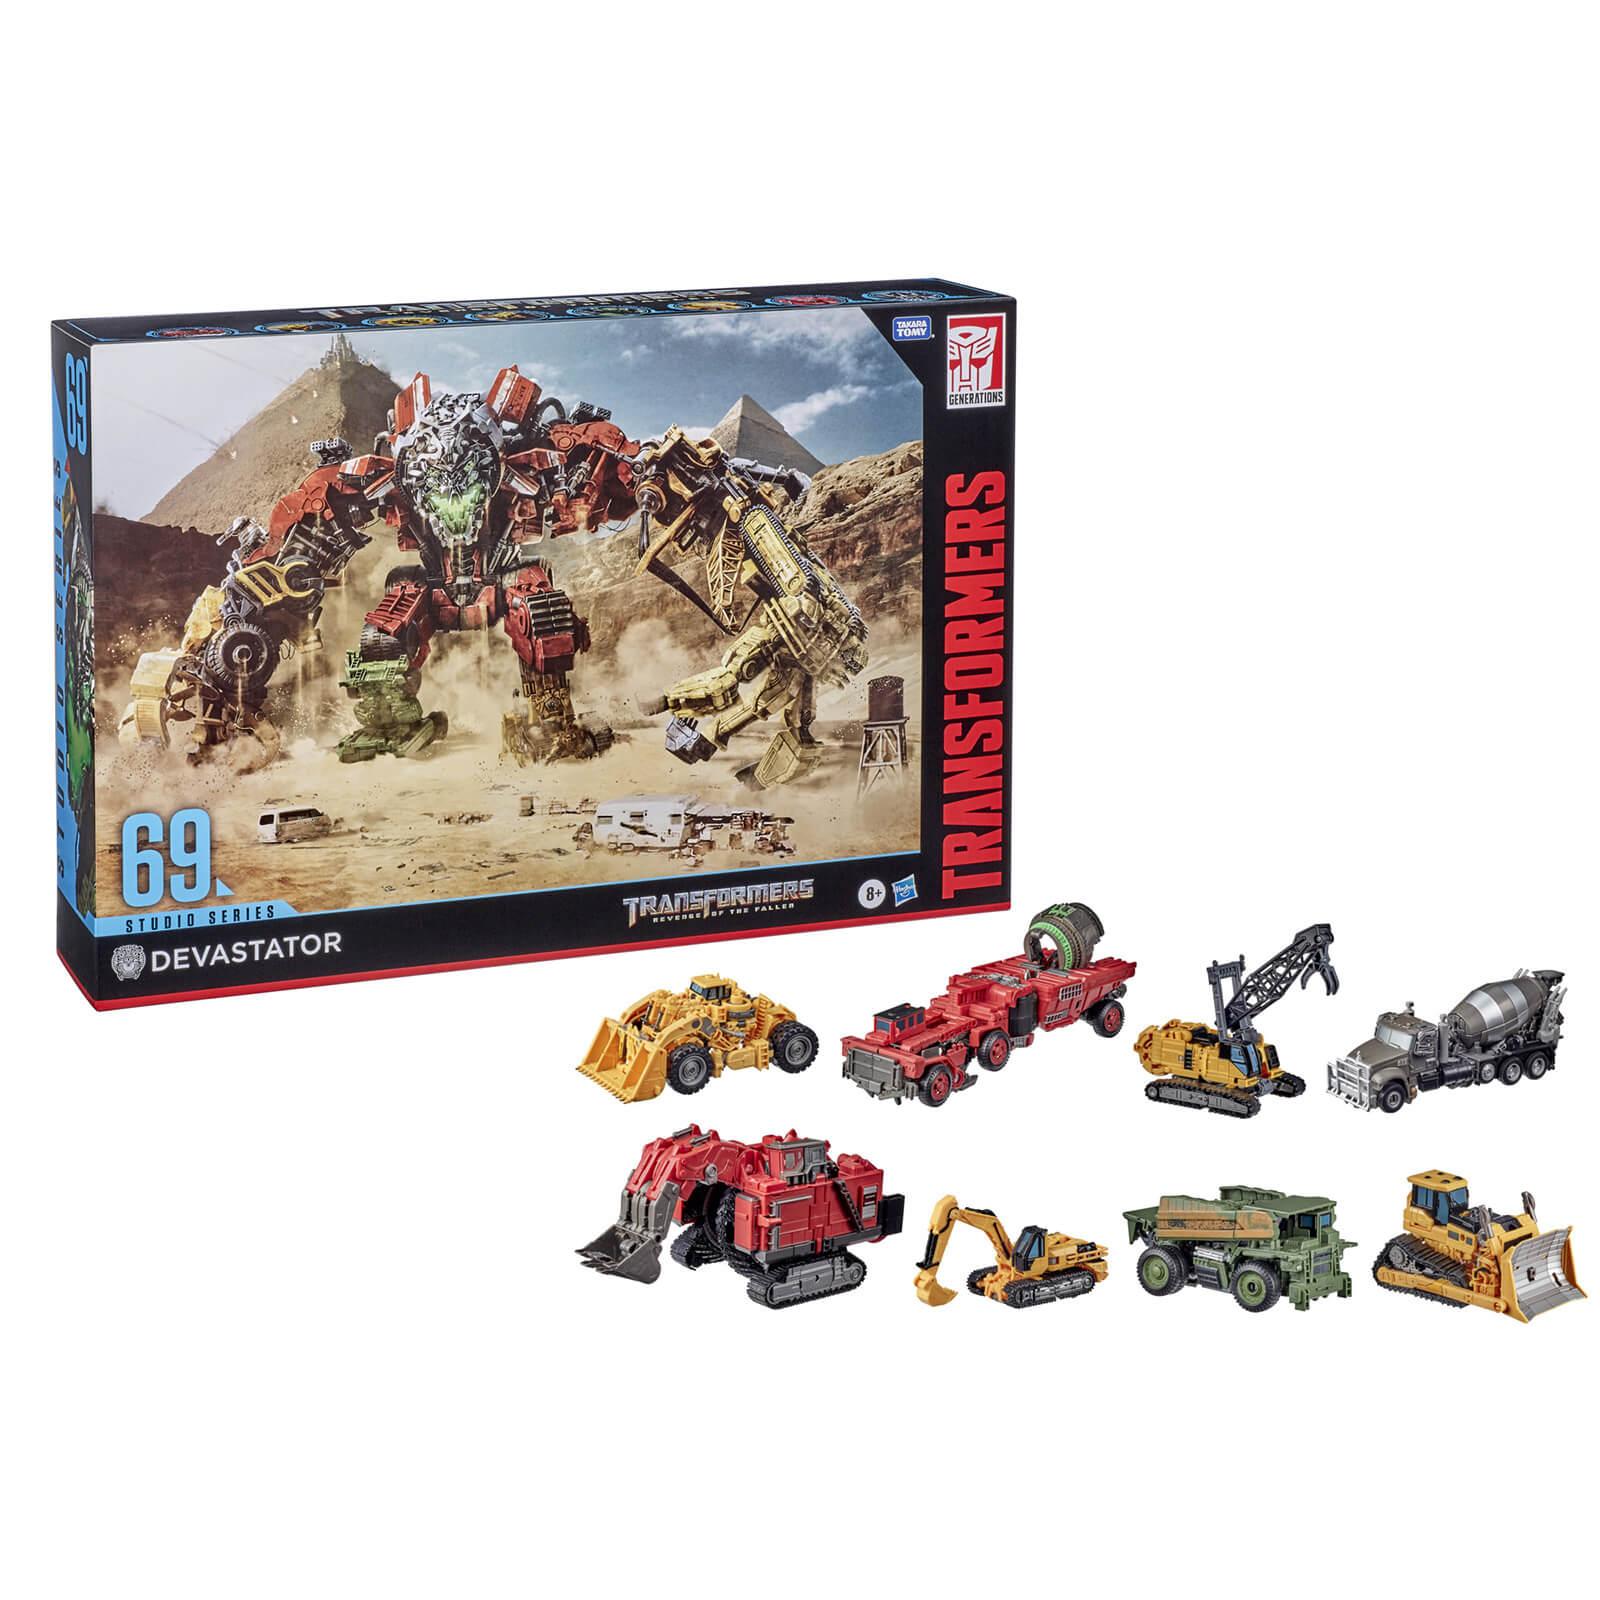 Hasbro Transformers Studio Series 69 Devastator Action Figure Set